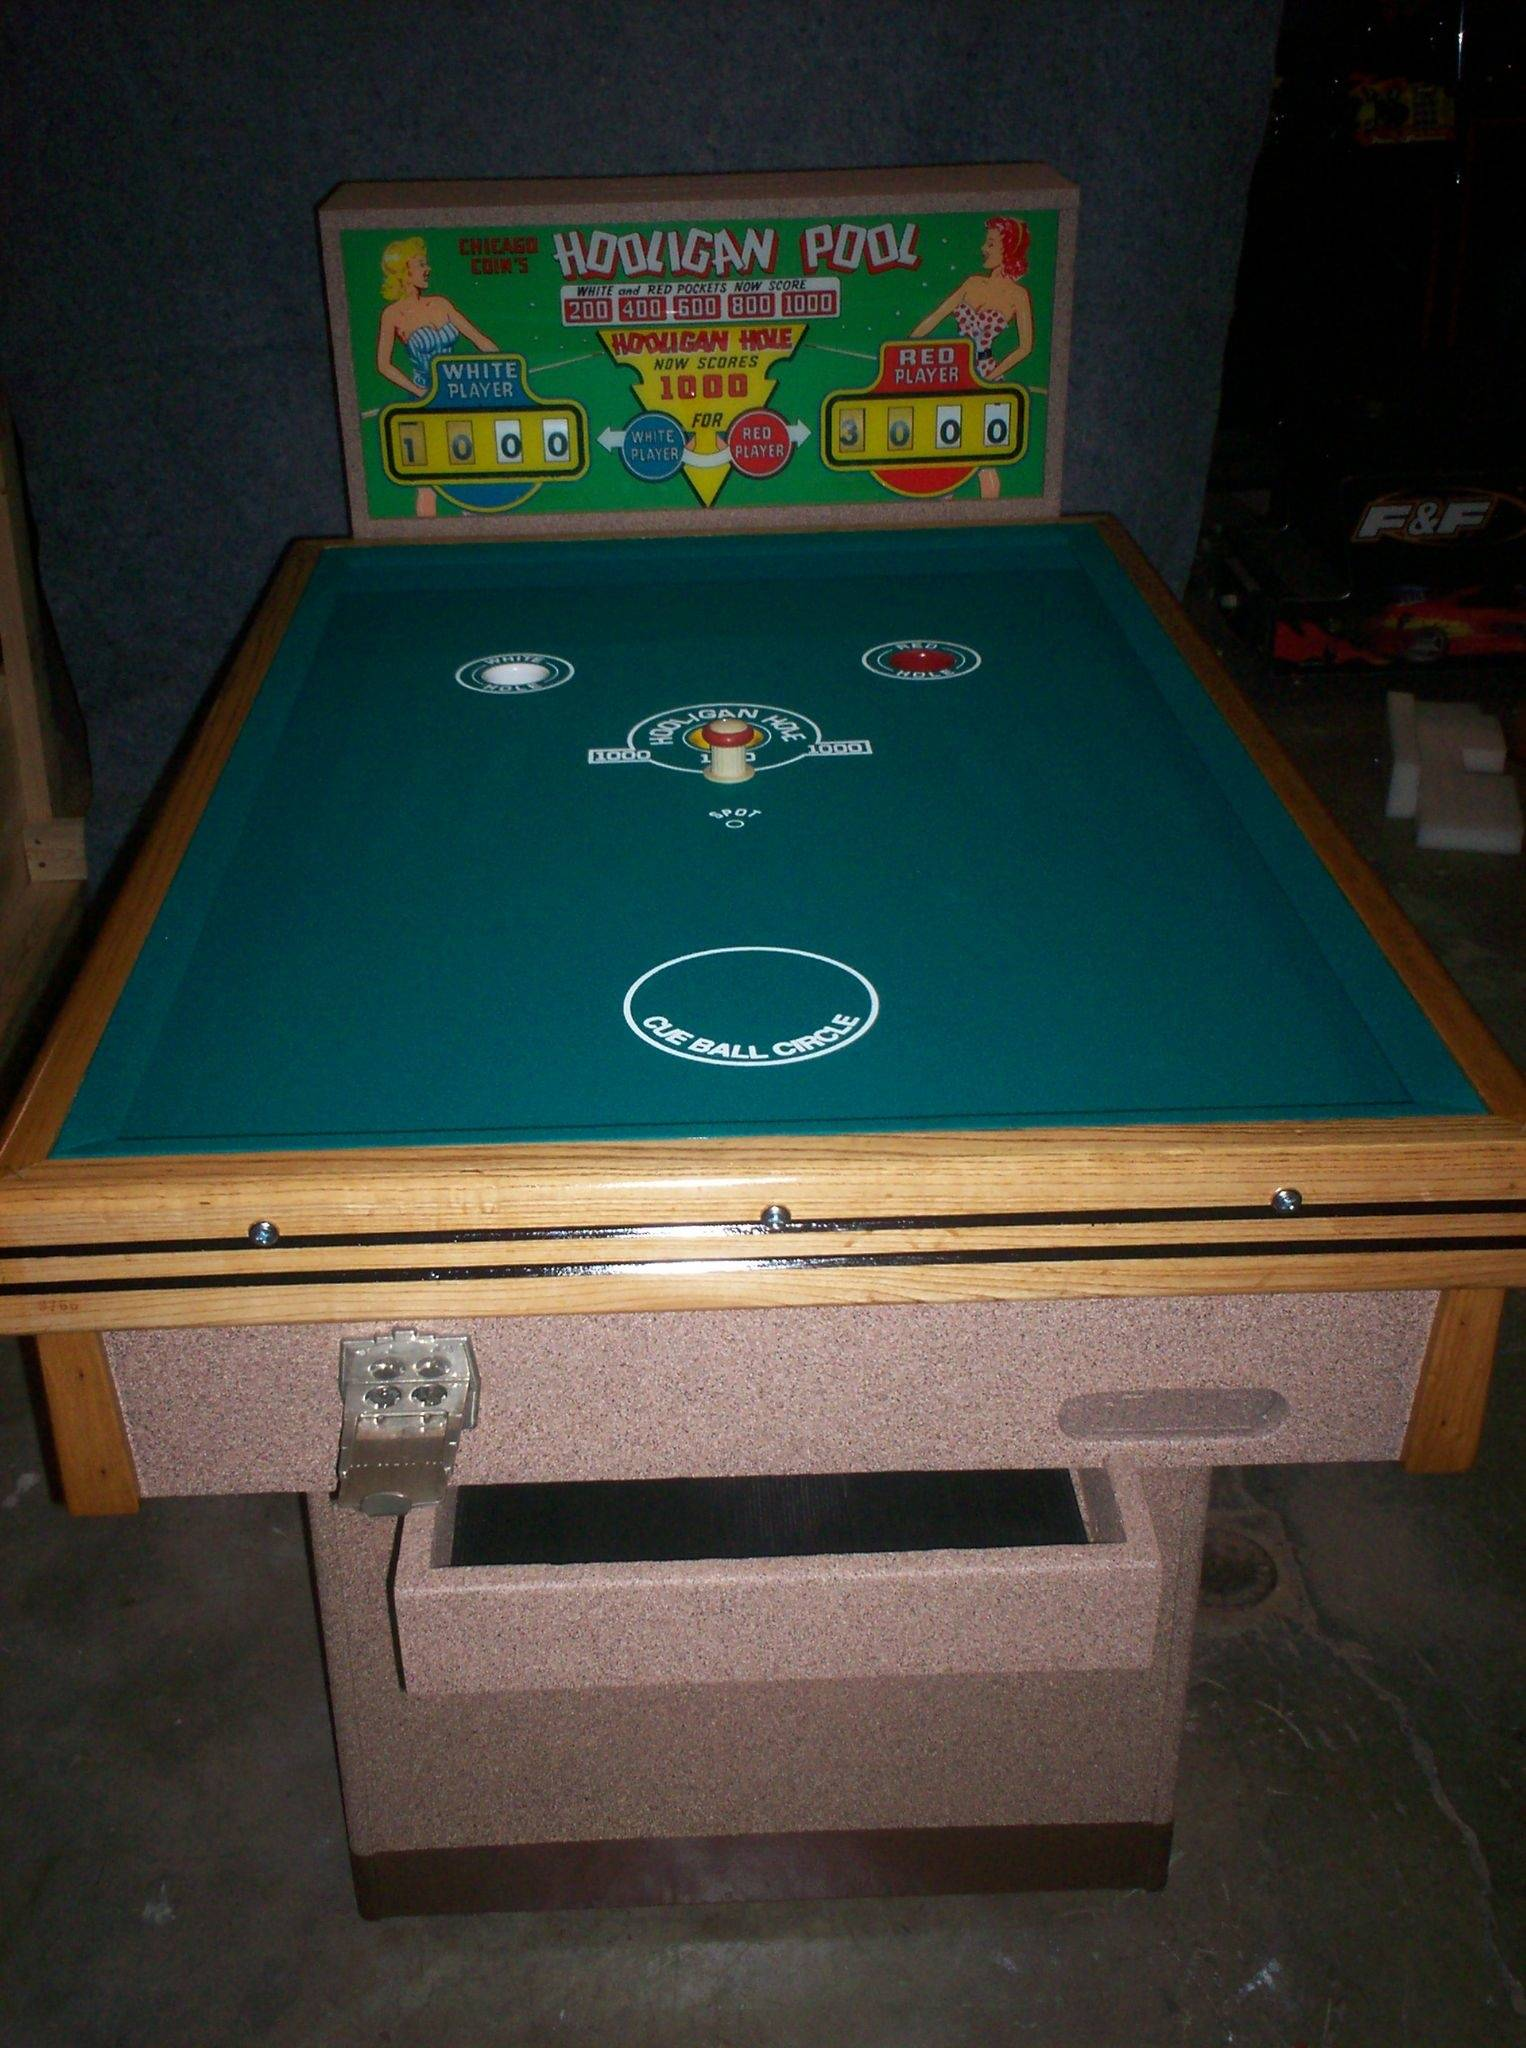 1950 chicago coin hooligan pool restoration restorations documented - Pool restoration ...